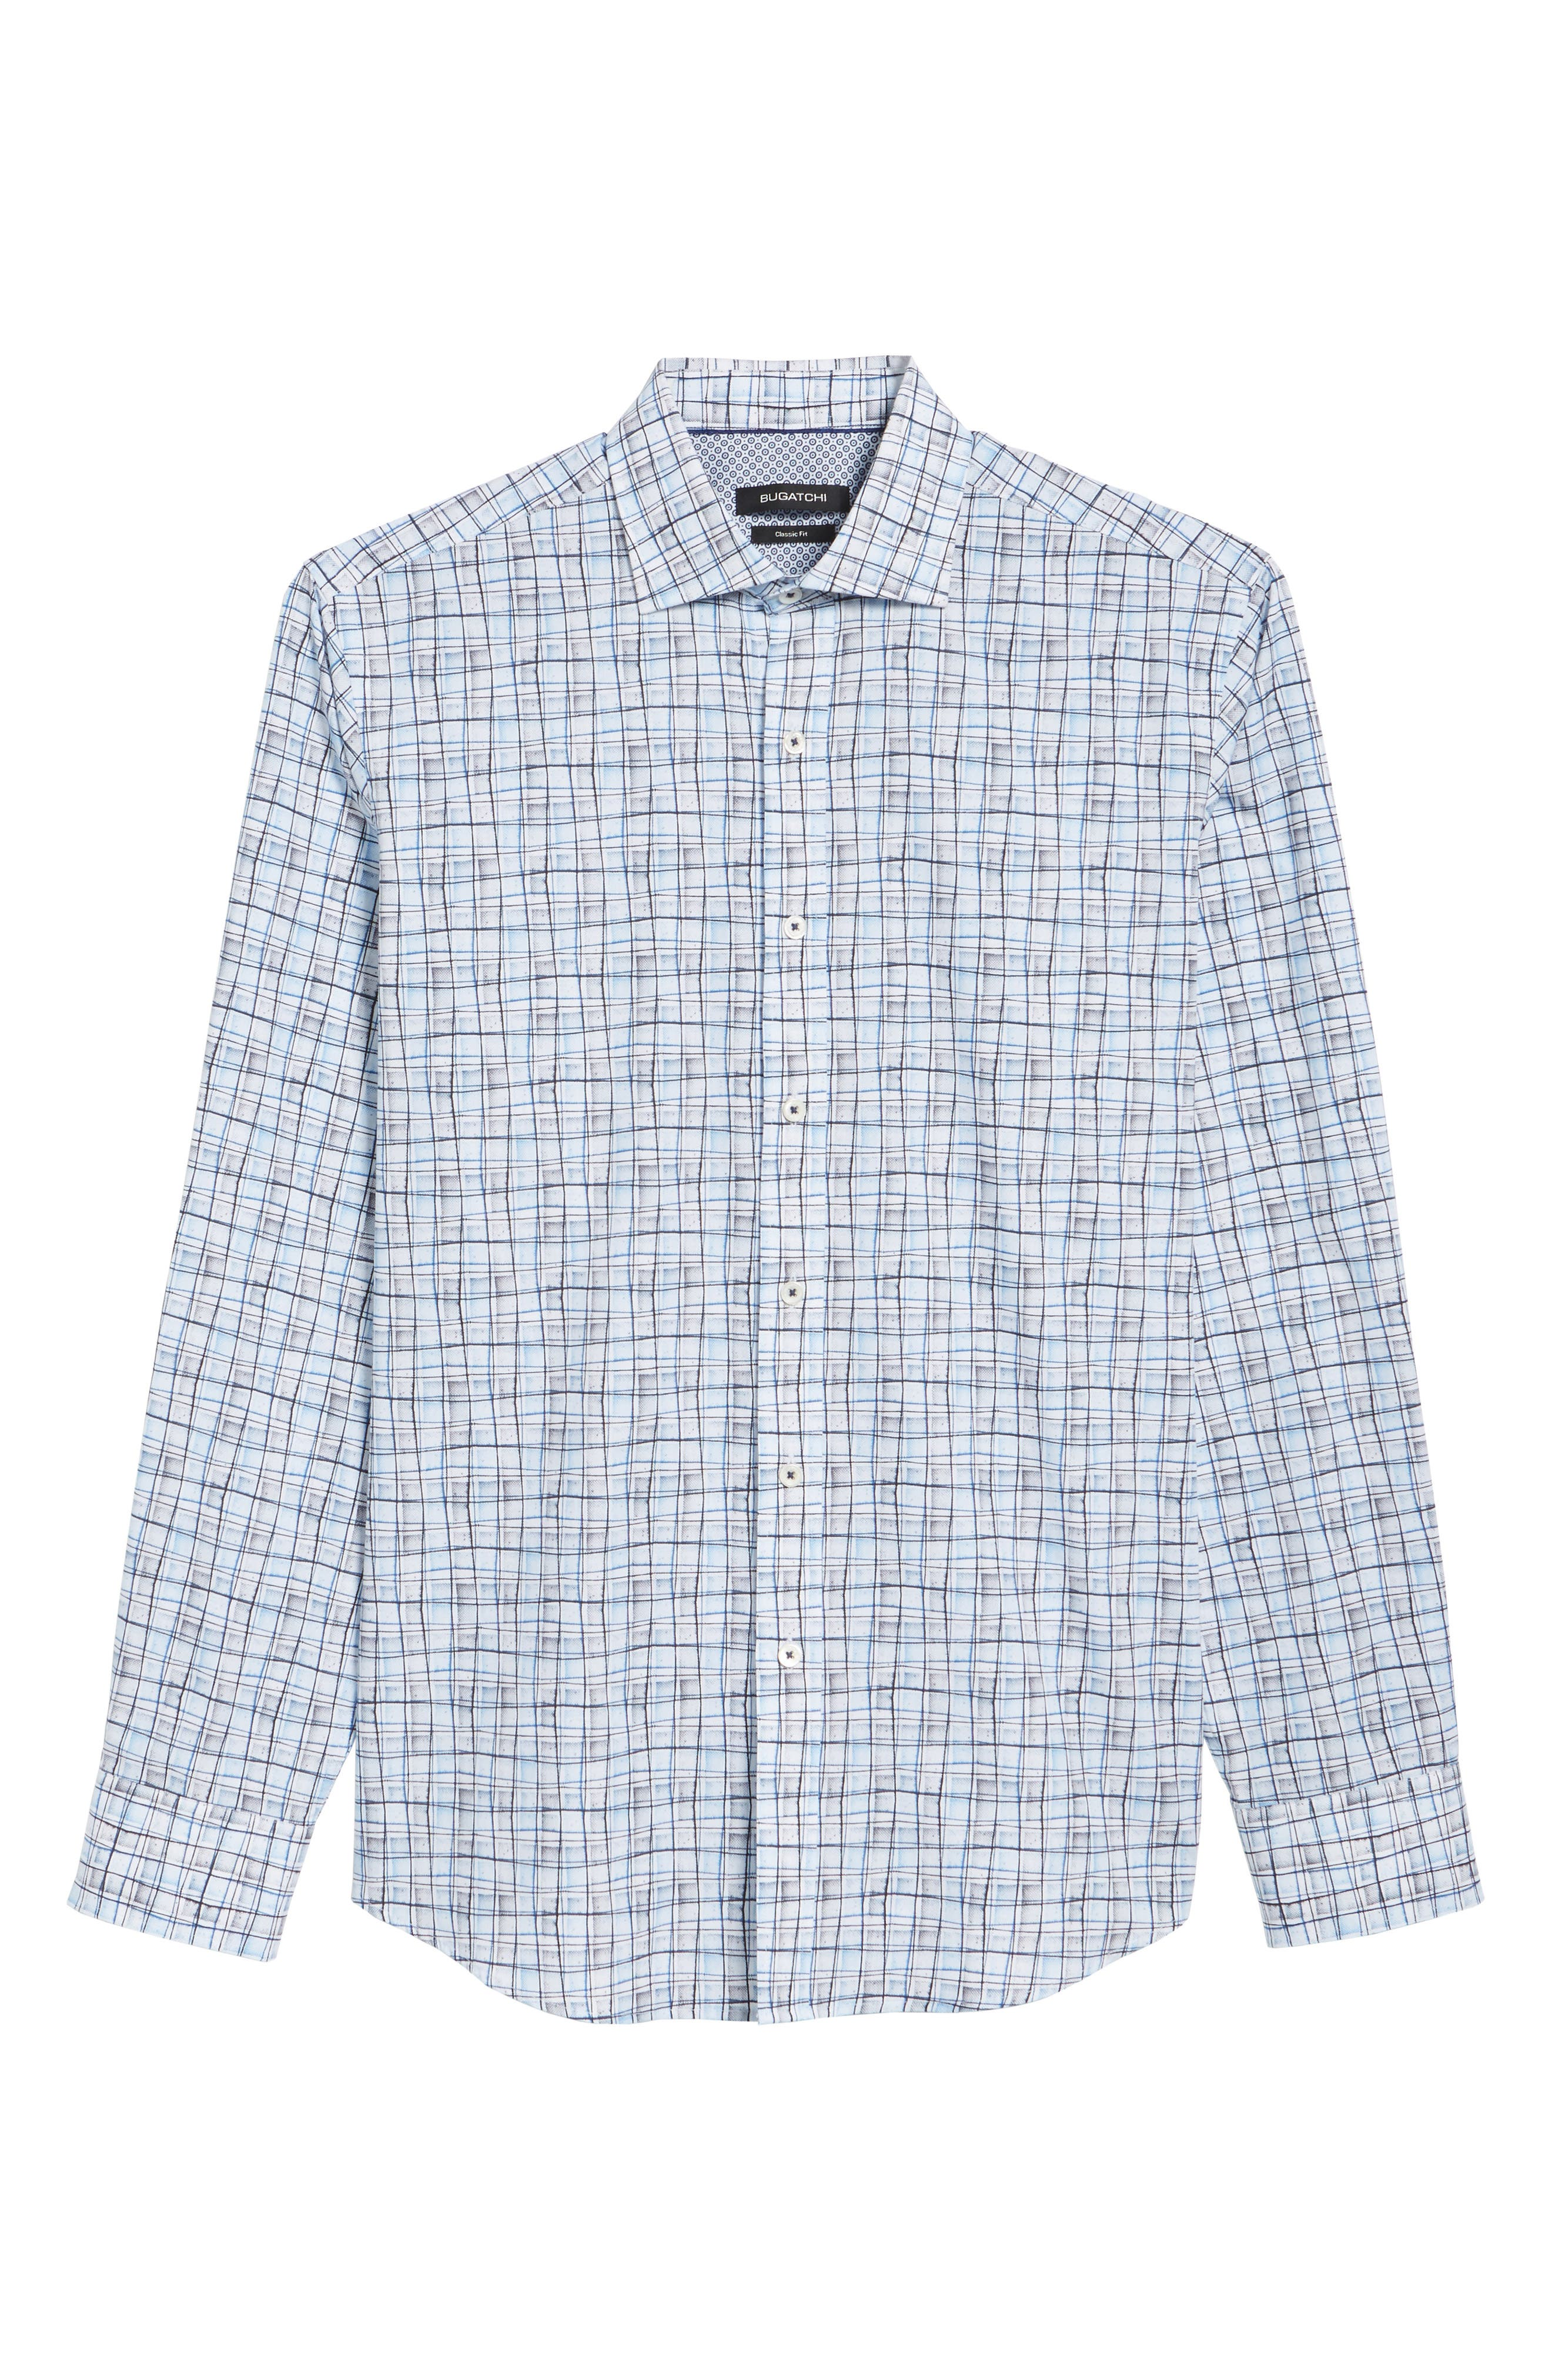 Regular Fit Grid Sport Shirt,                             Alternate thumbnail 6, color,                             040